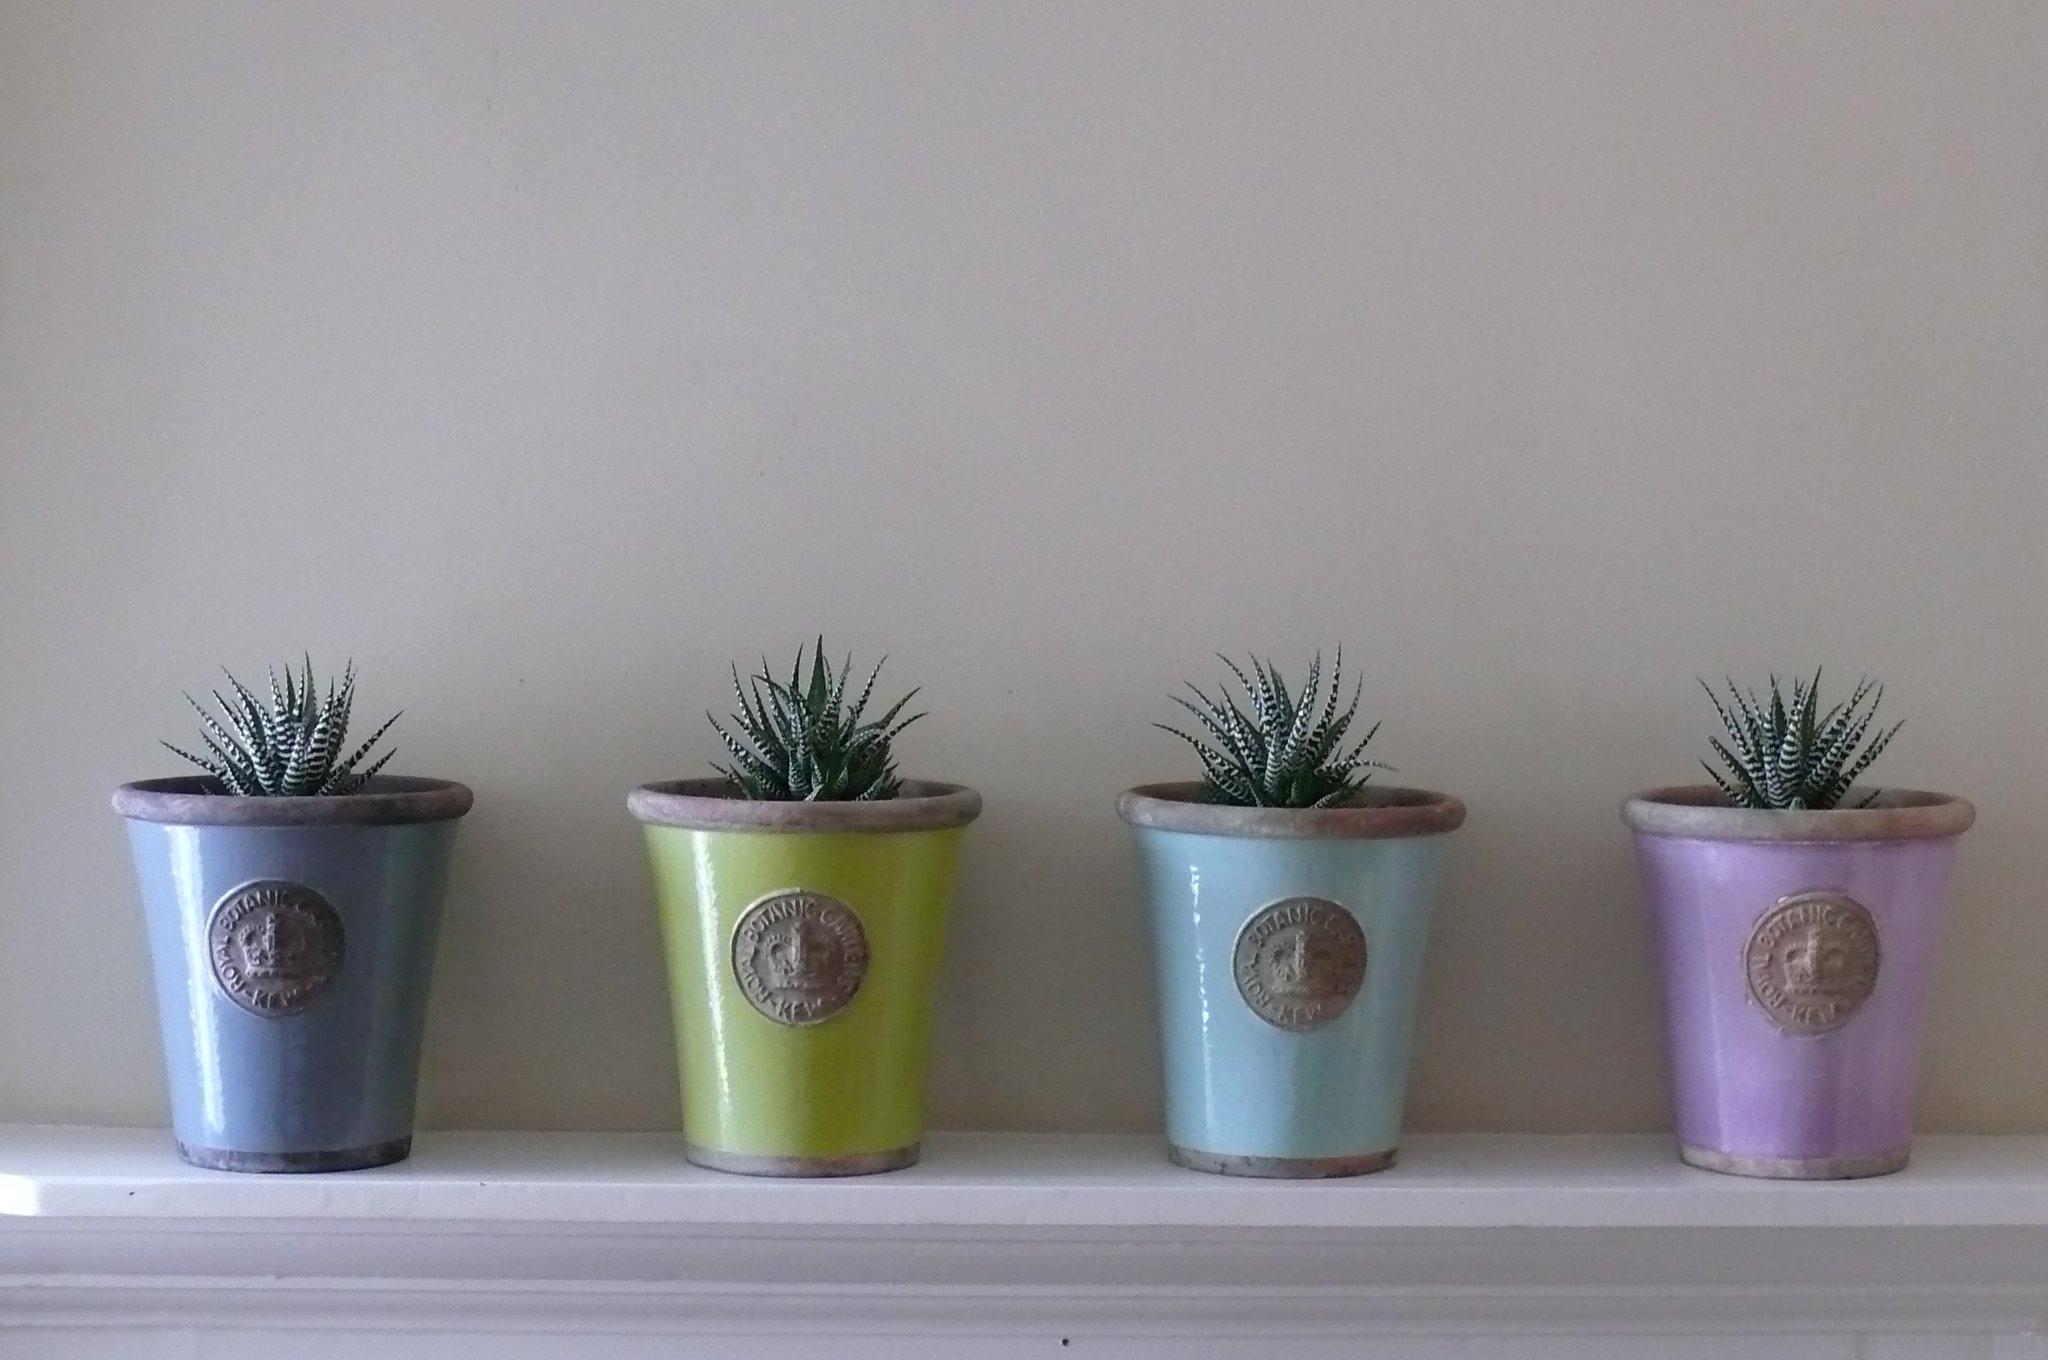 Kew Garden pots planted with Haworthia fascinata 'Big Band' - £38 -